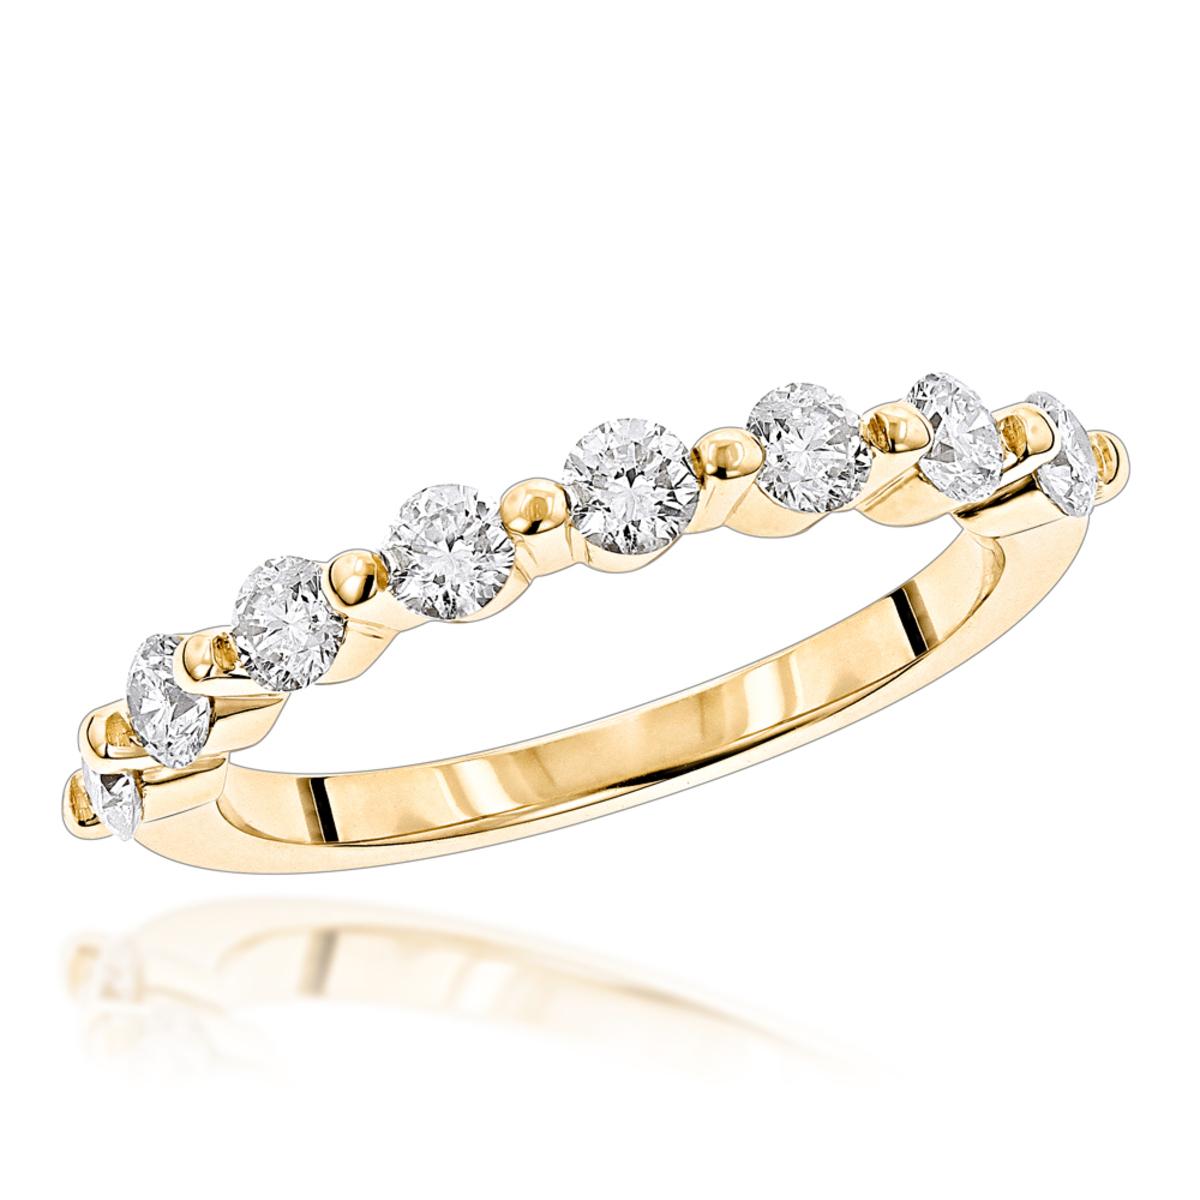 Ultra Thin Ladies 1 Row Diamond Ring 0.5ct 14K Gold